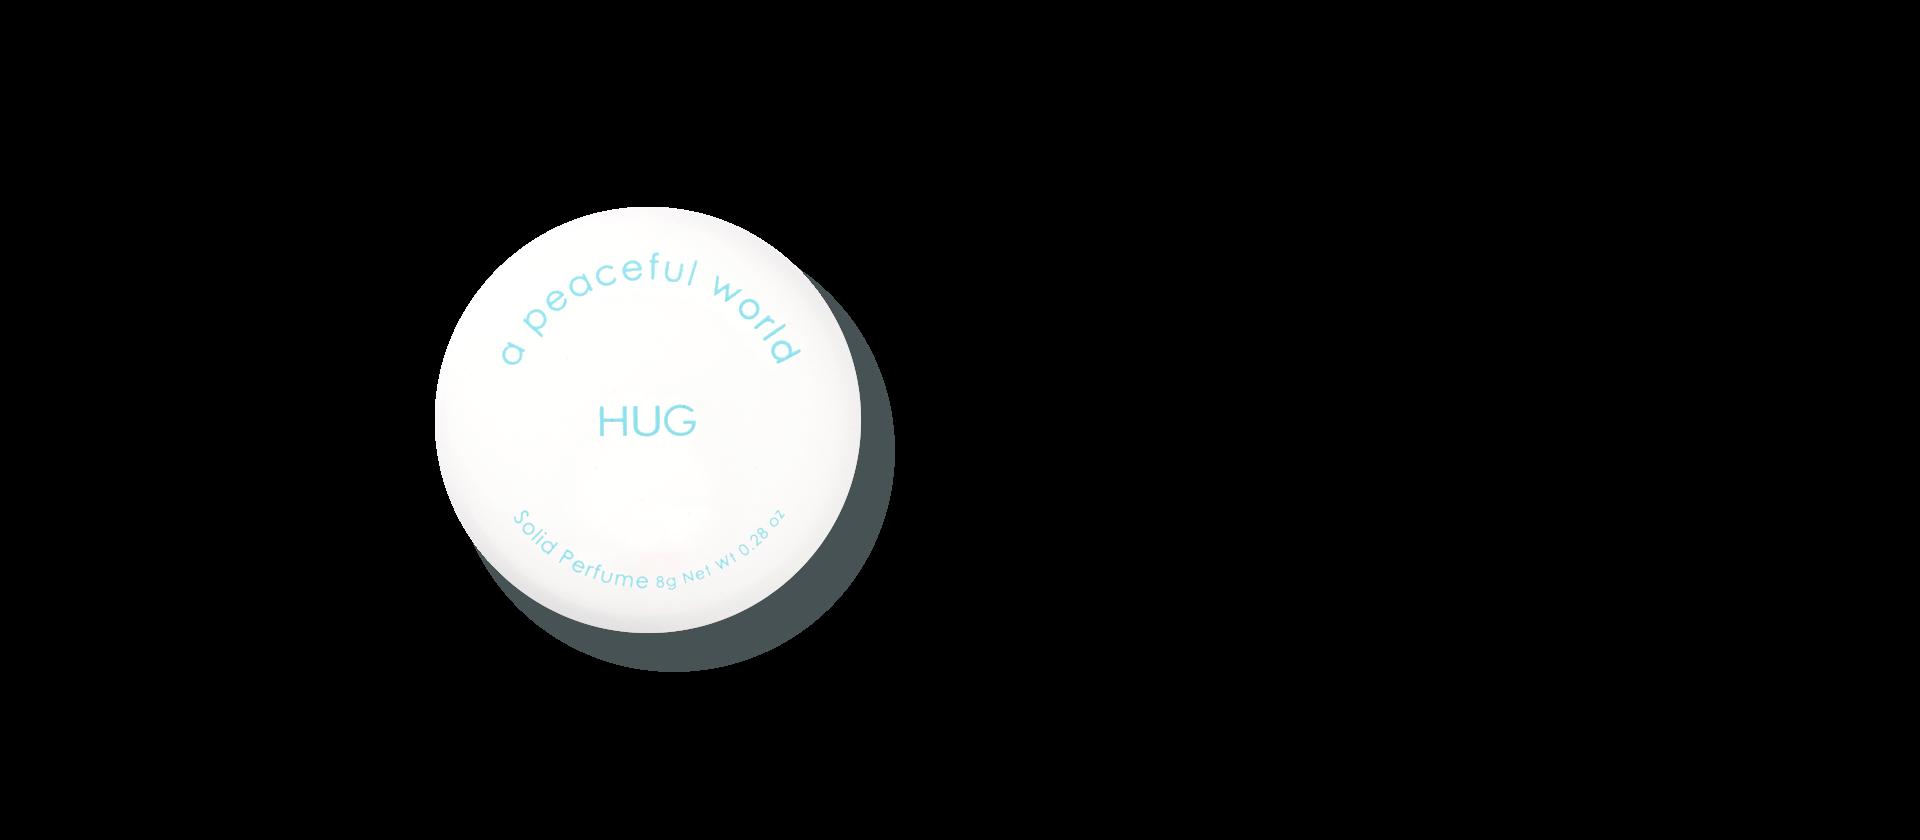 a peaceful world HUG